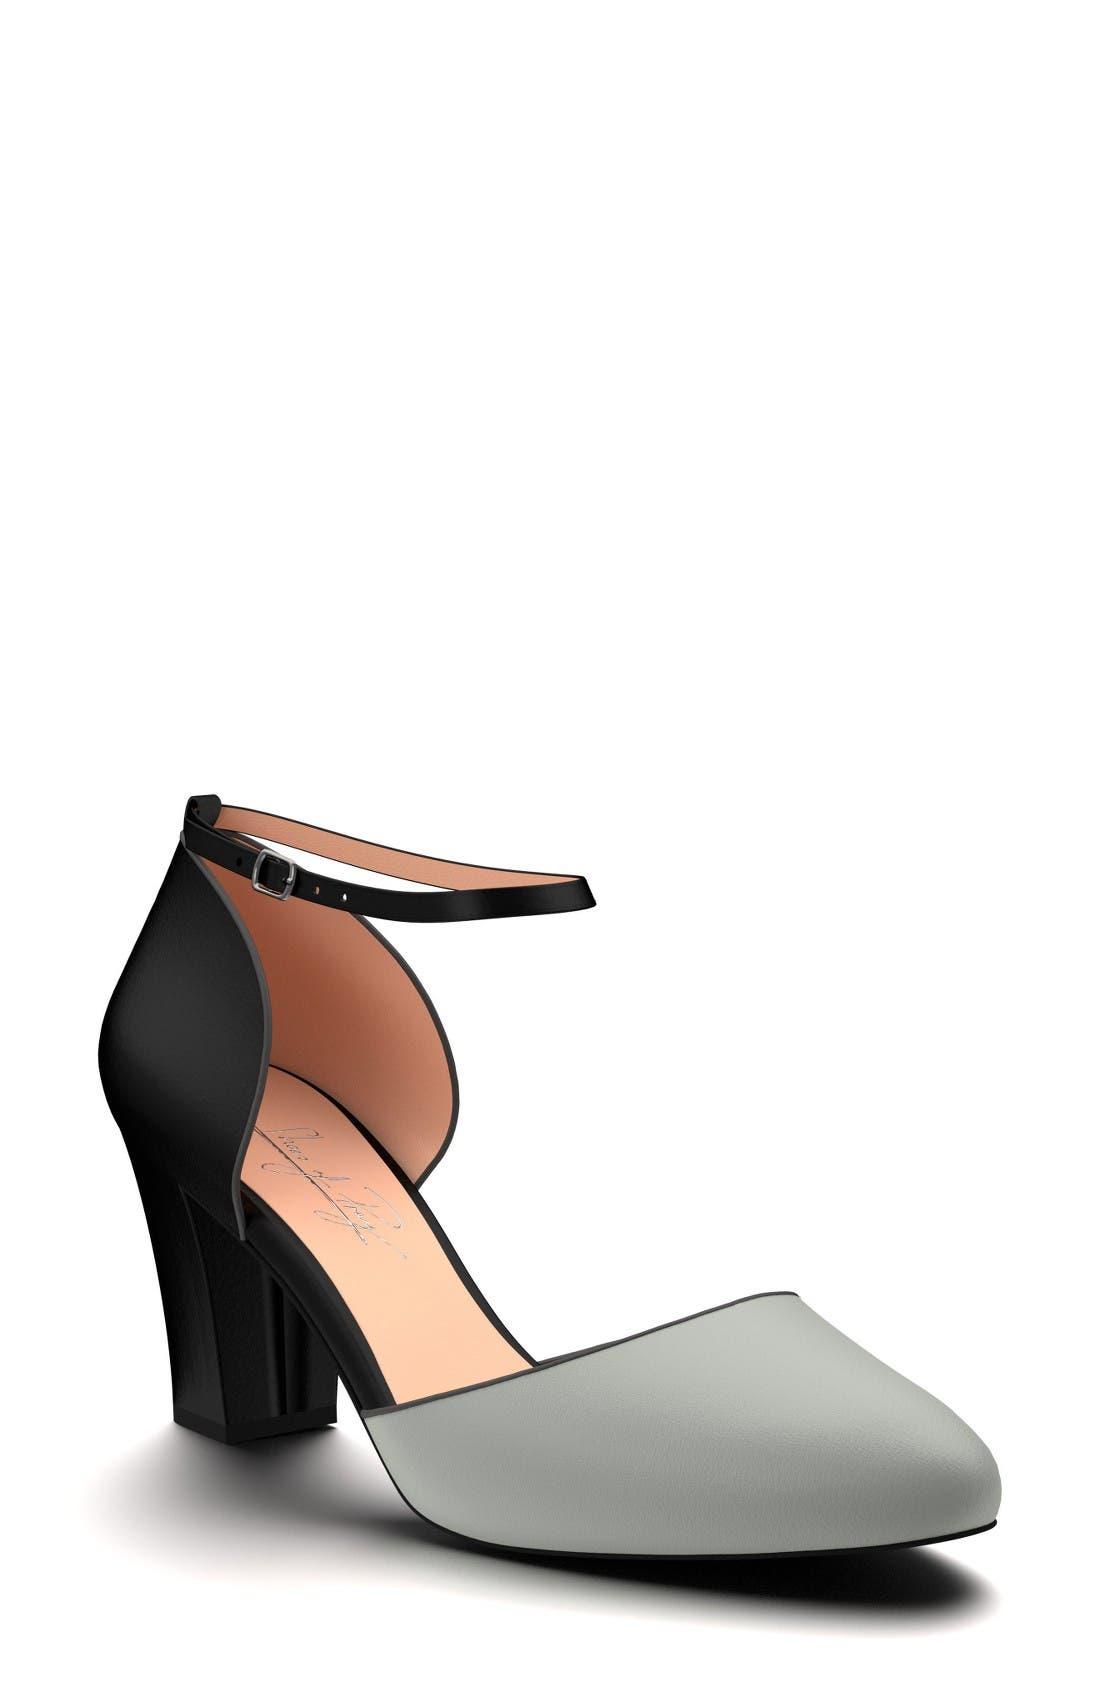 Alternate Image 1 Selected - Shoes of Prey Block Heel d'Orsay Pump (Women)